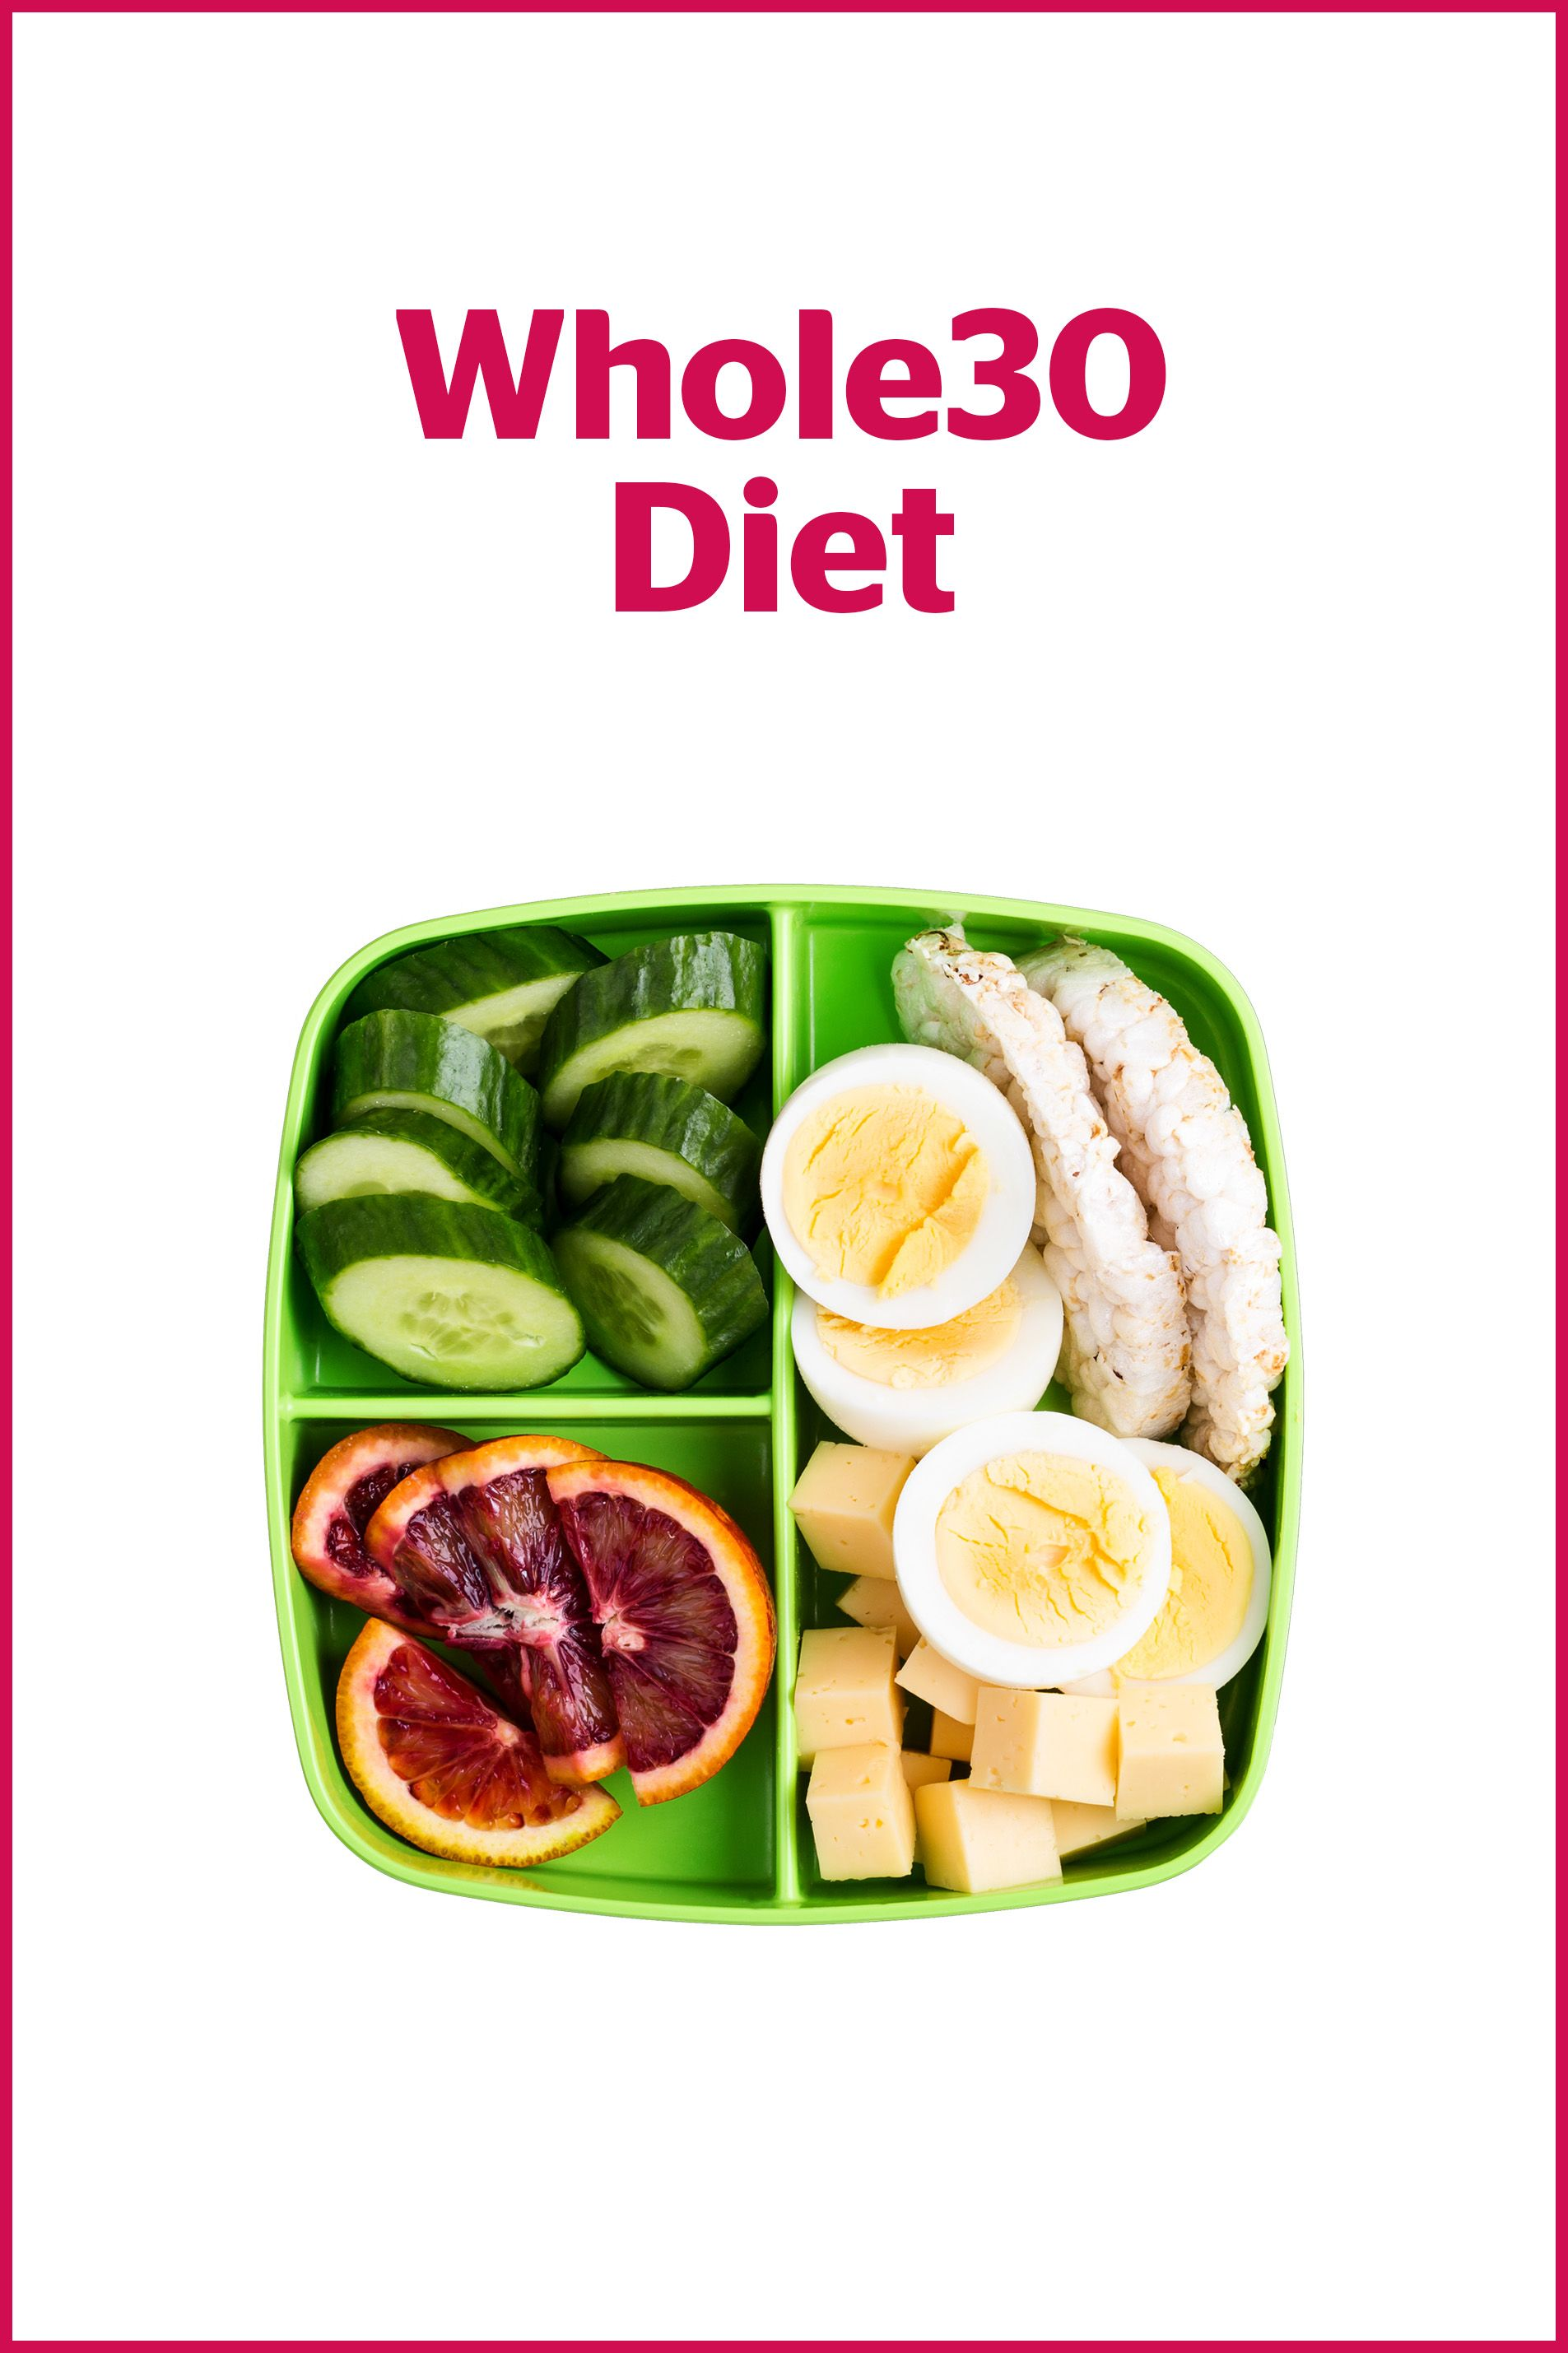 Tlc diet book